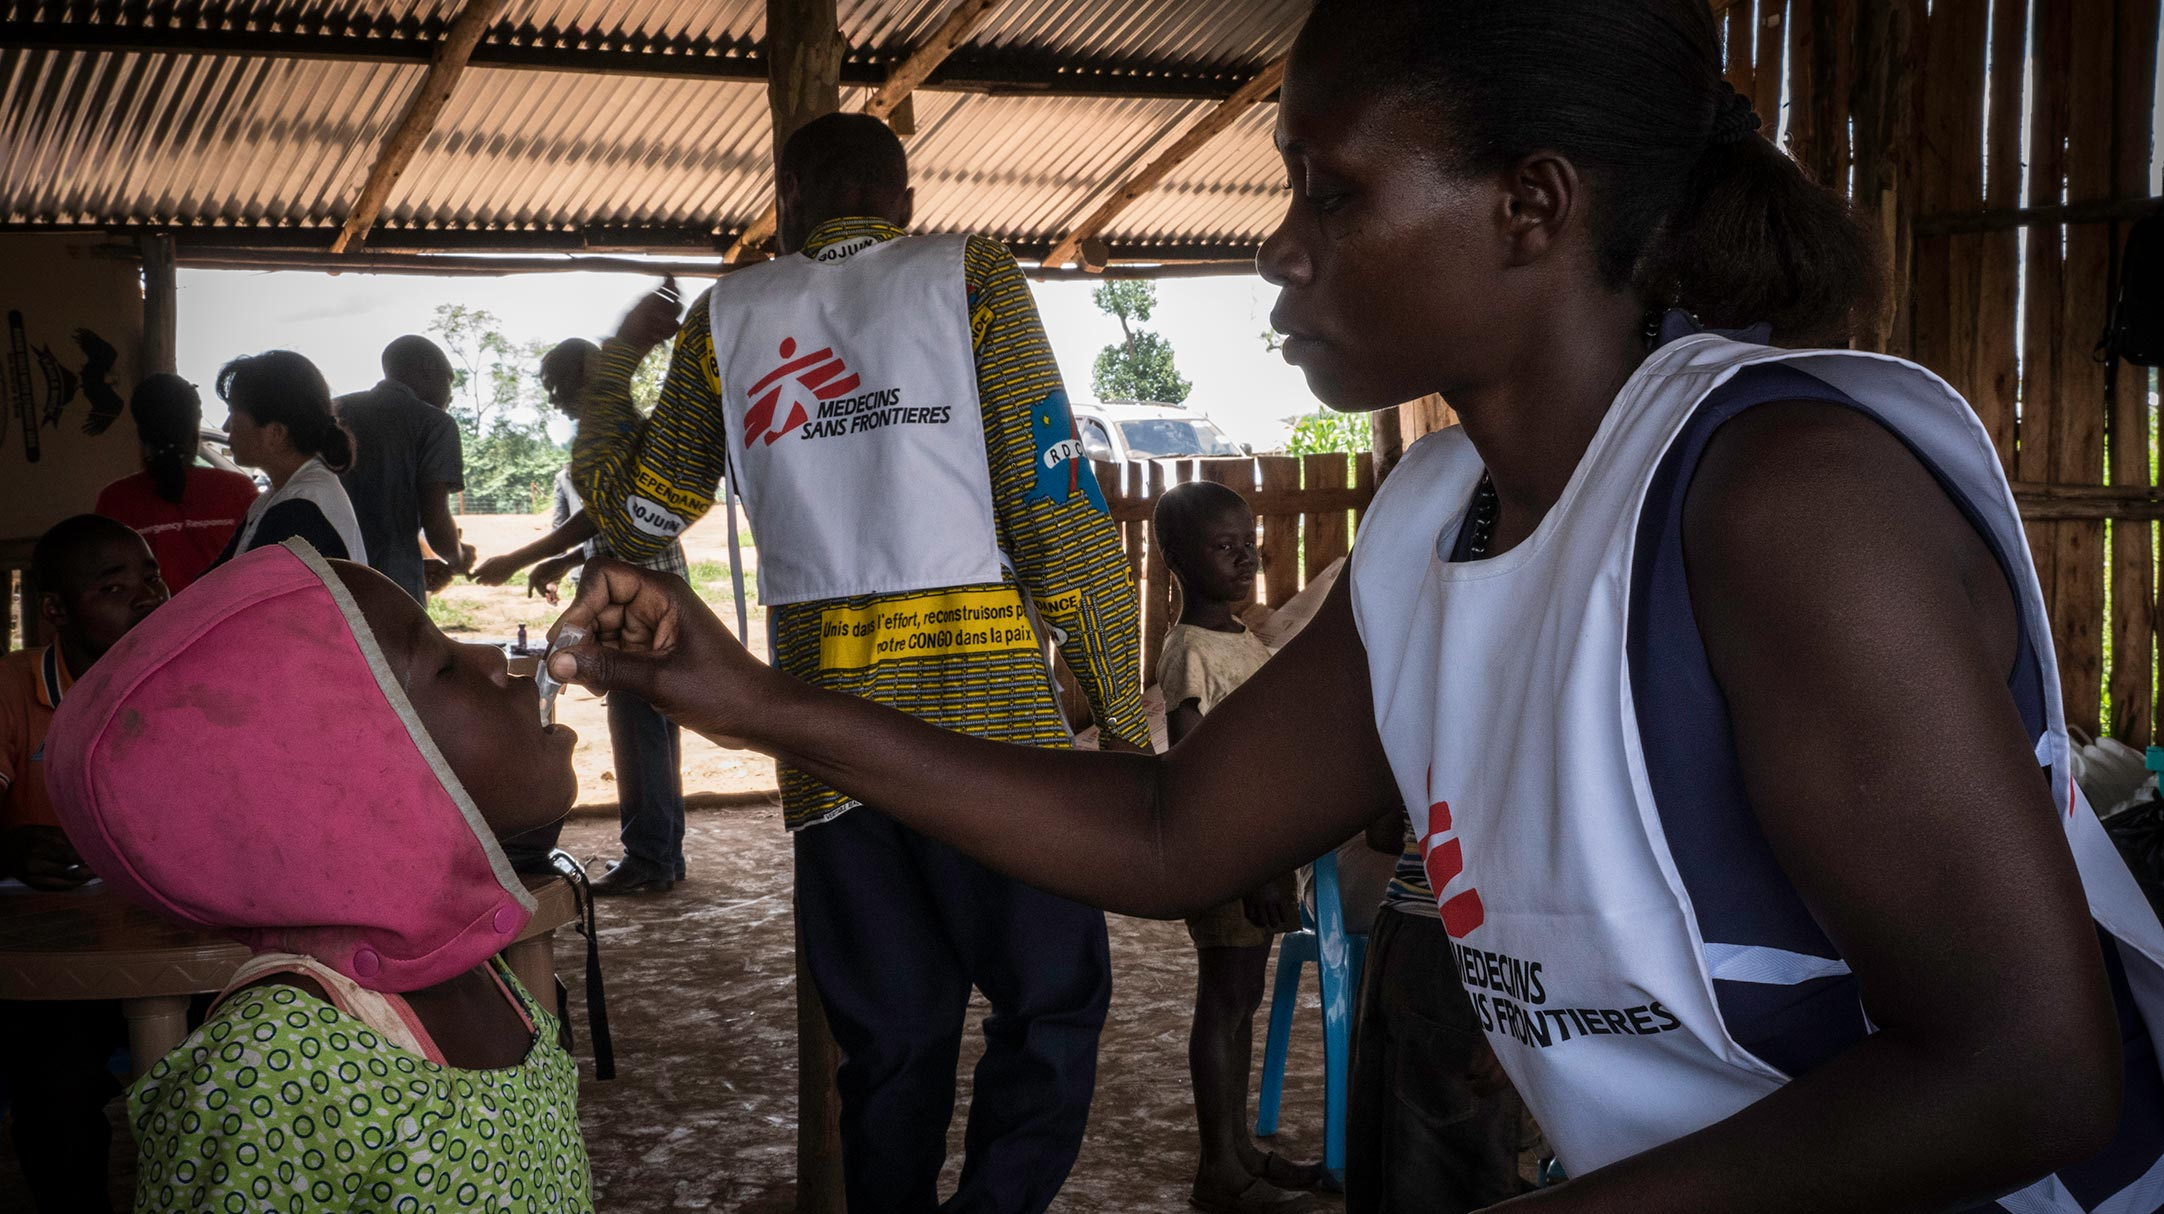 Operatori umanitari di Medici Senza Frontiere durante una campagna di vaccinazione